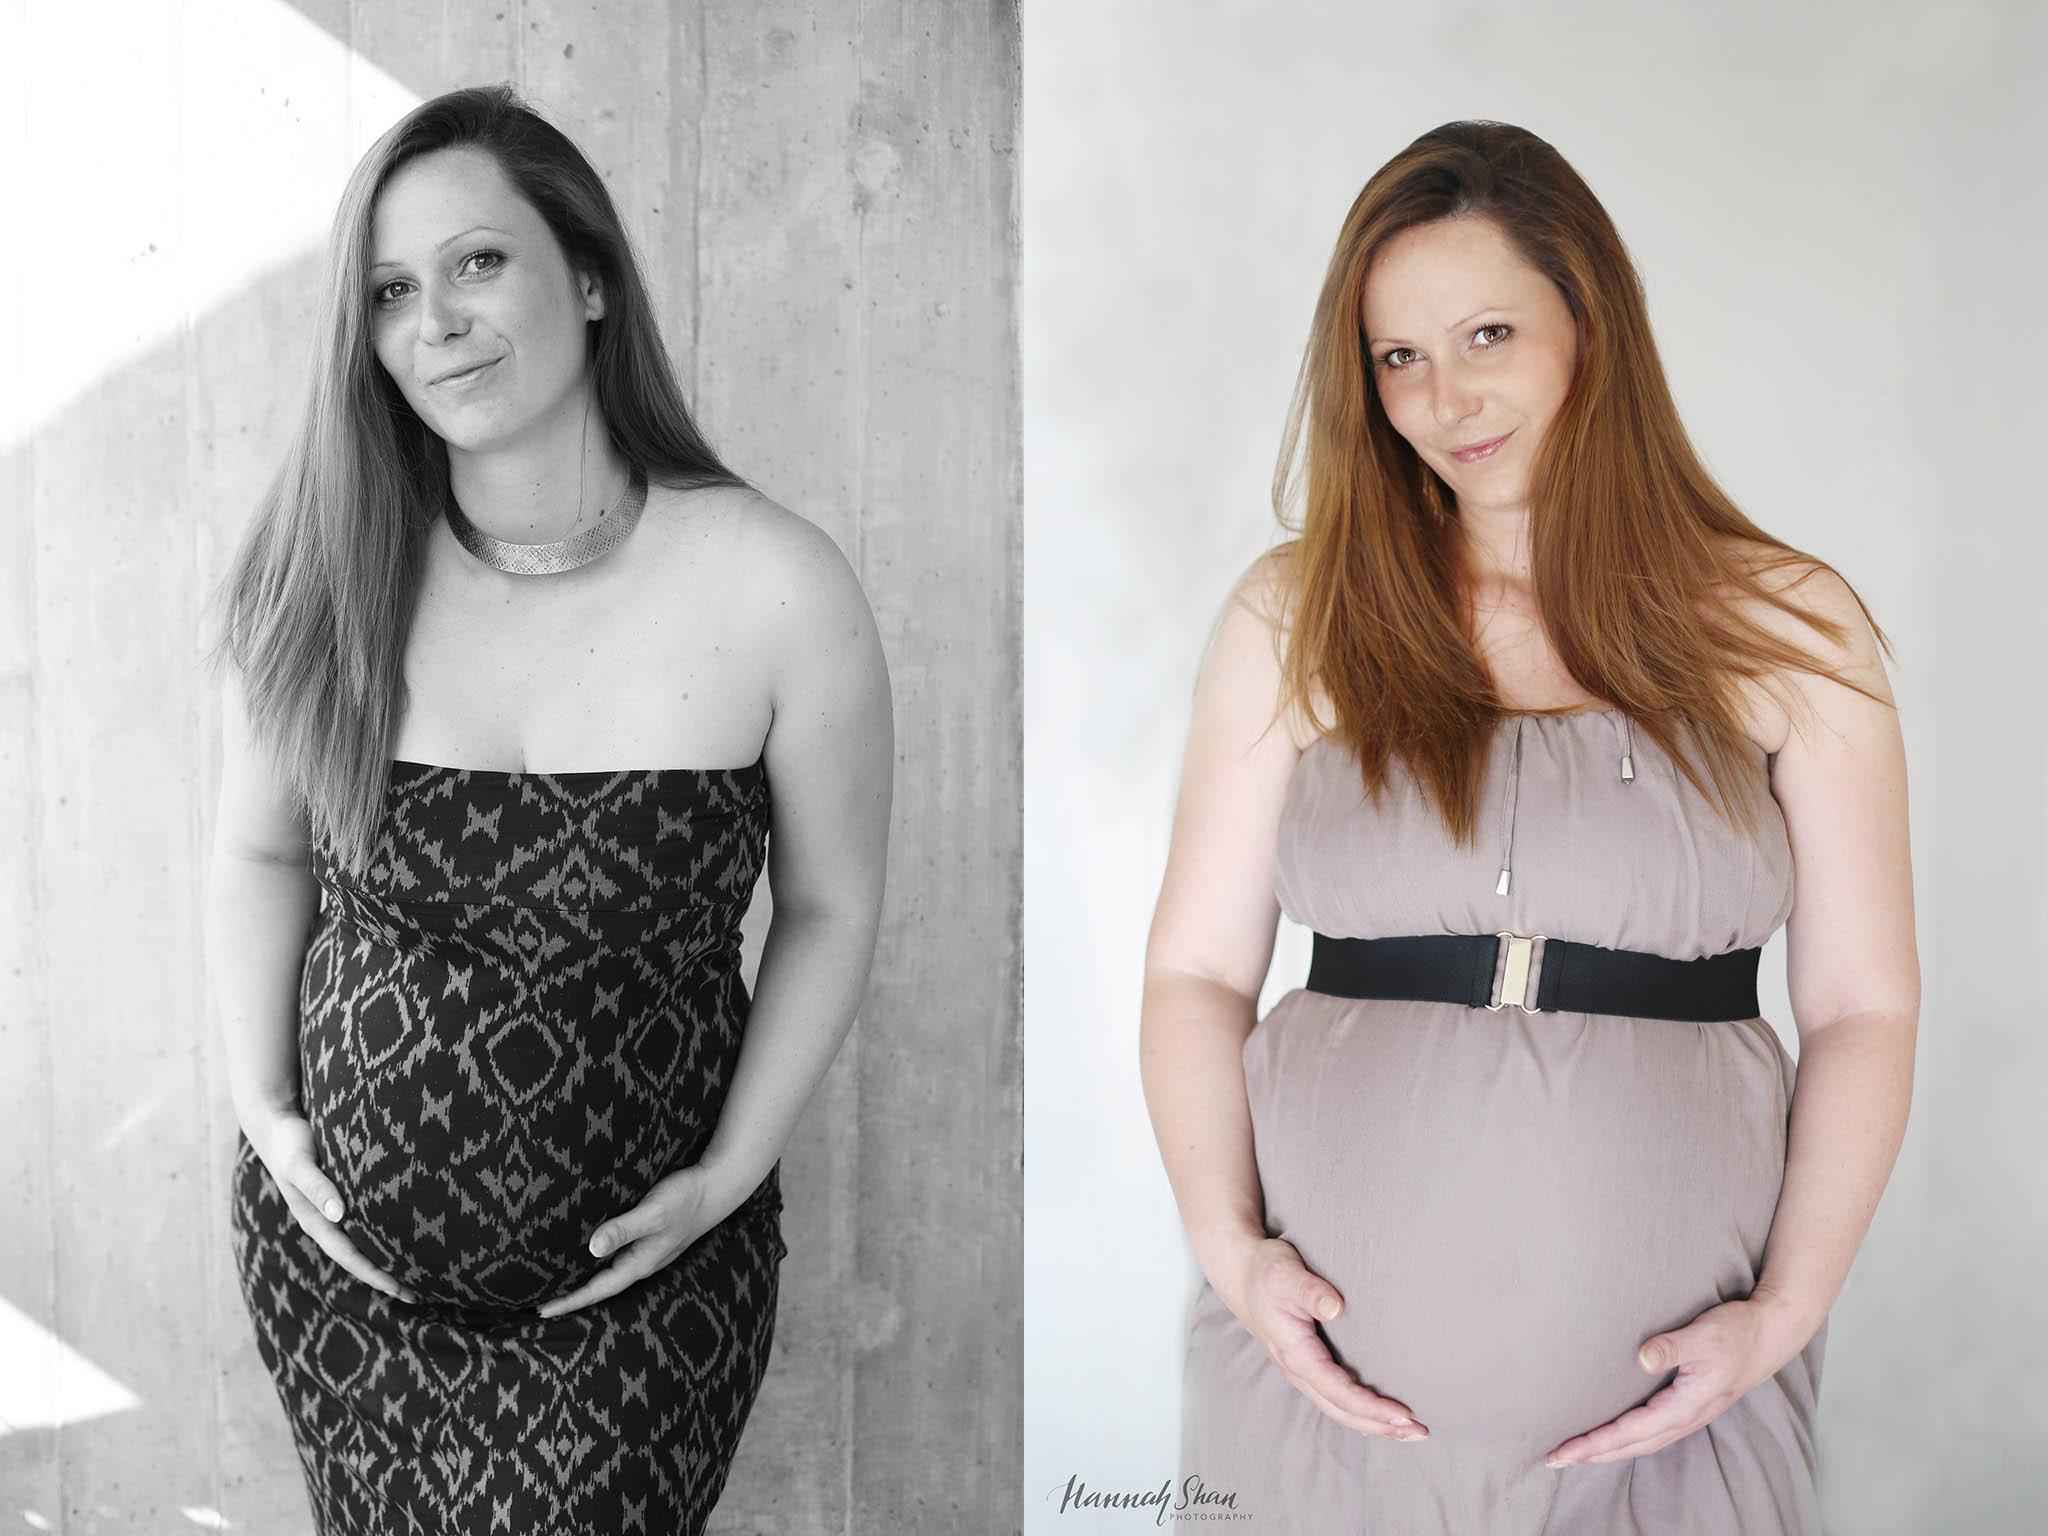 HannahShanPhotography-Lausanne-Maternity-Pregnancy-N-3.jpg